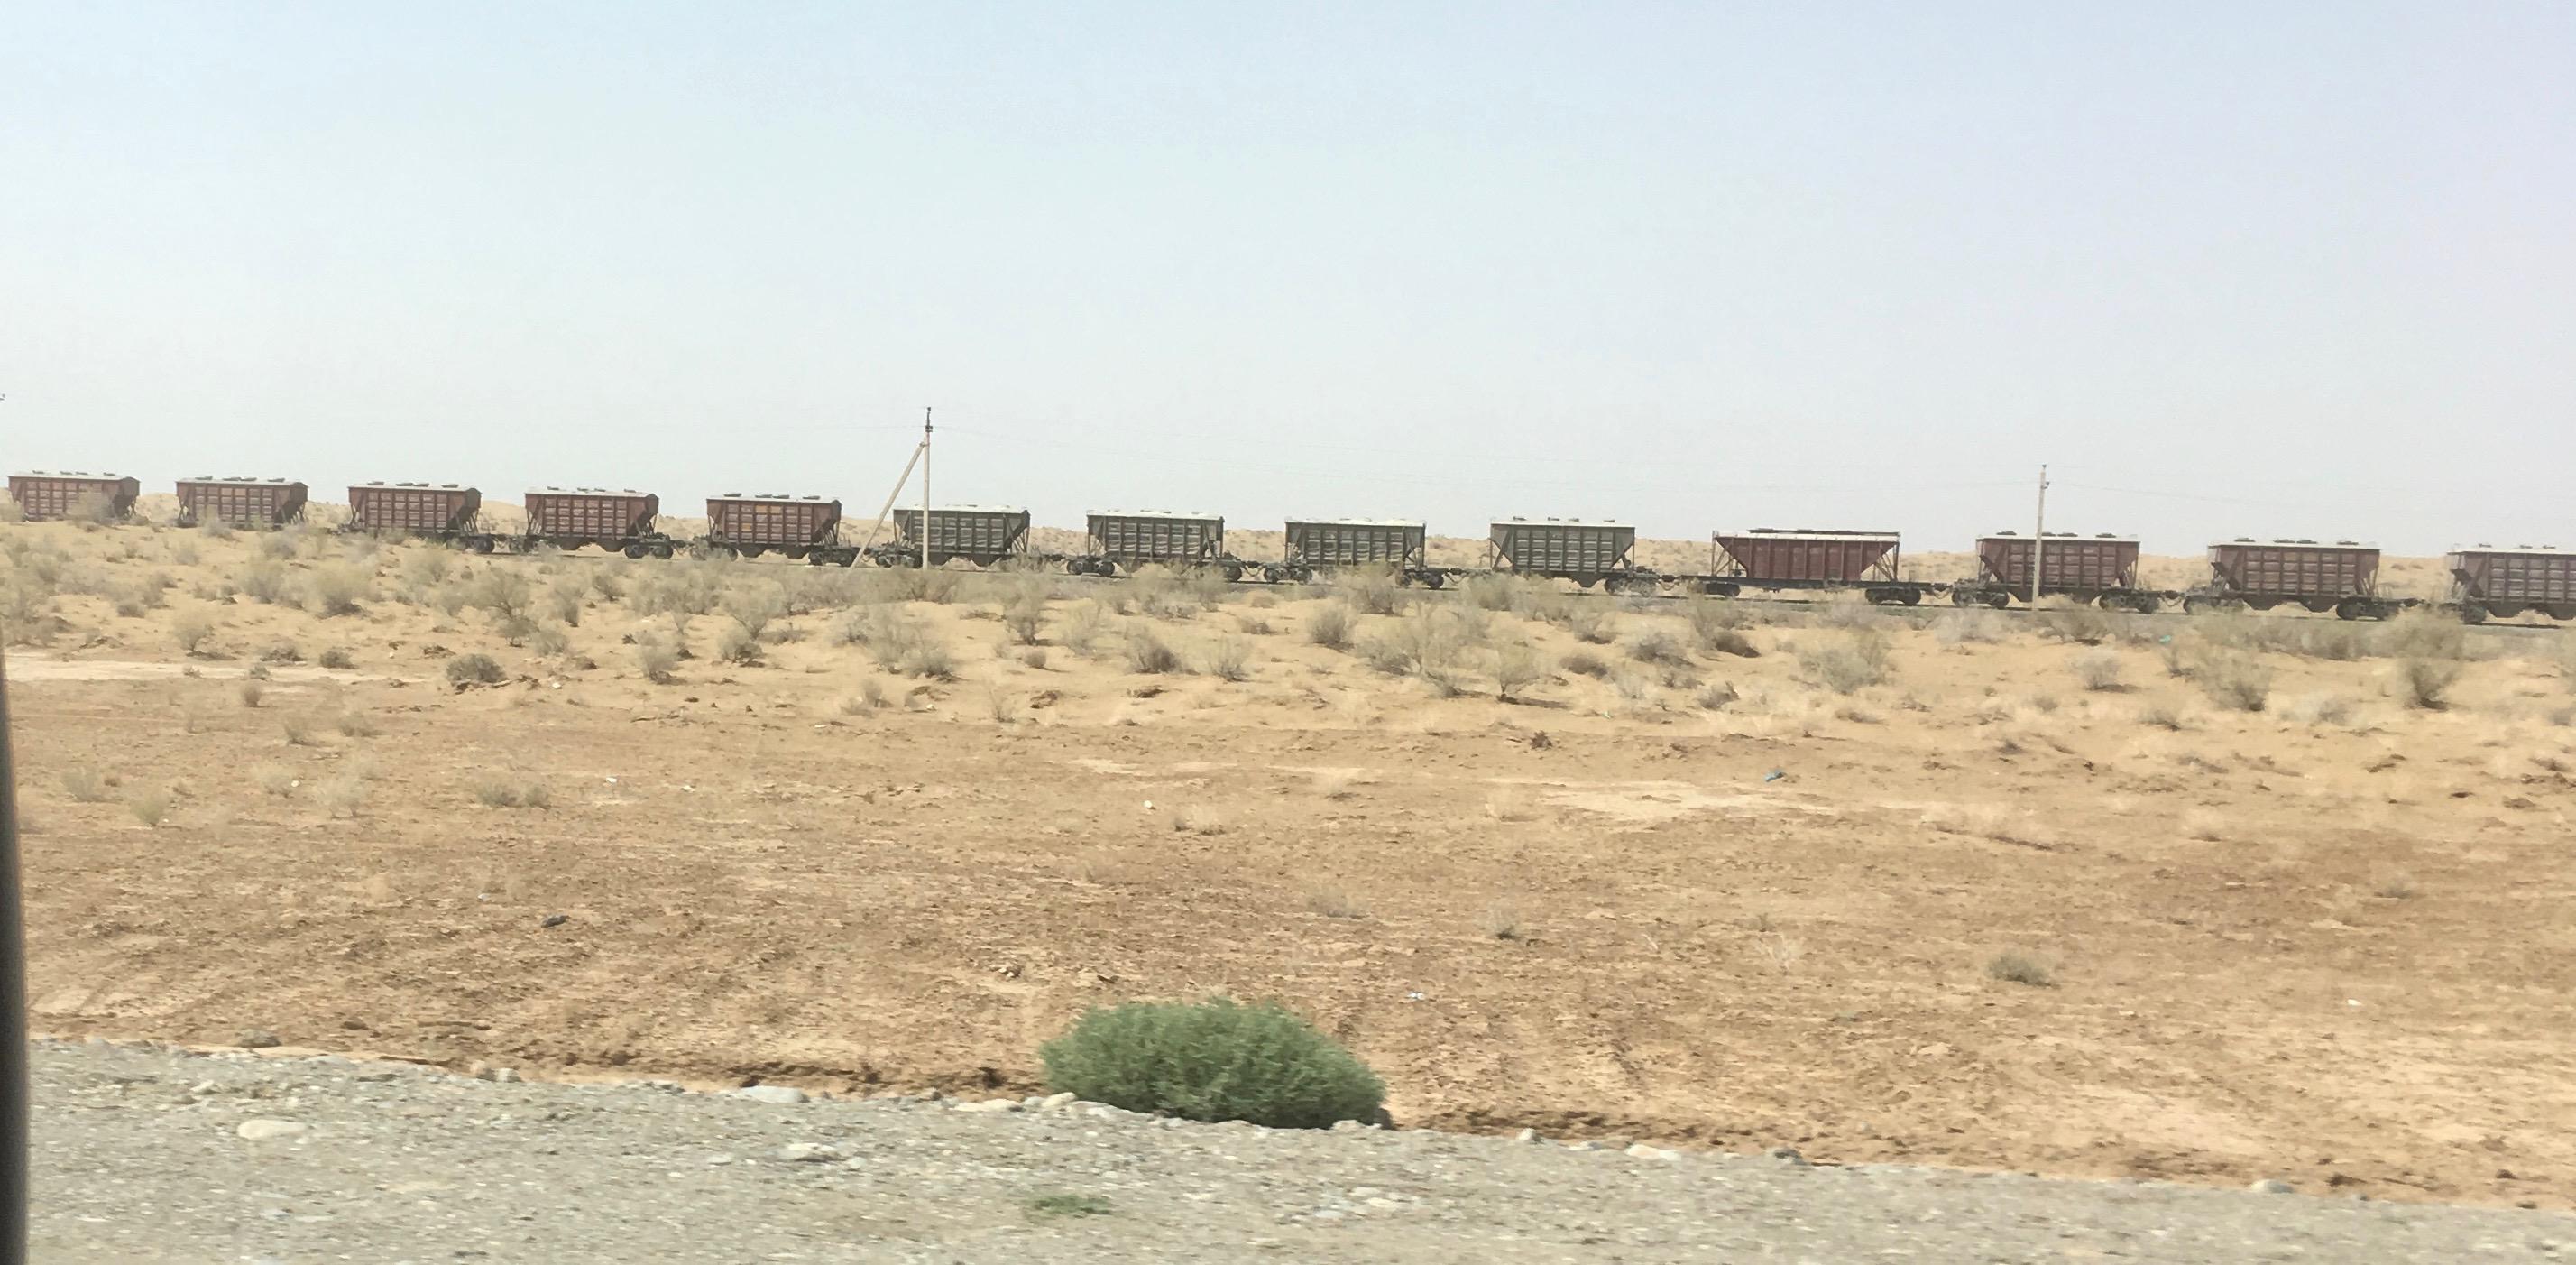 Cargo Trucks, Karakum Desert, Turkmenistan